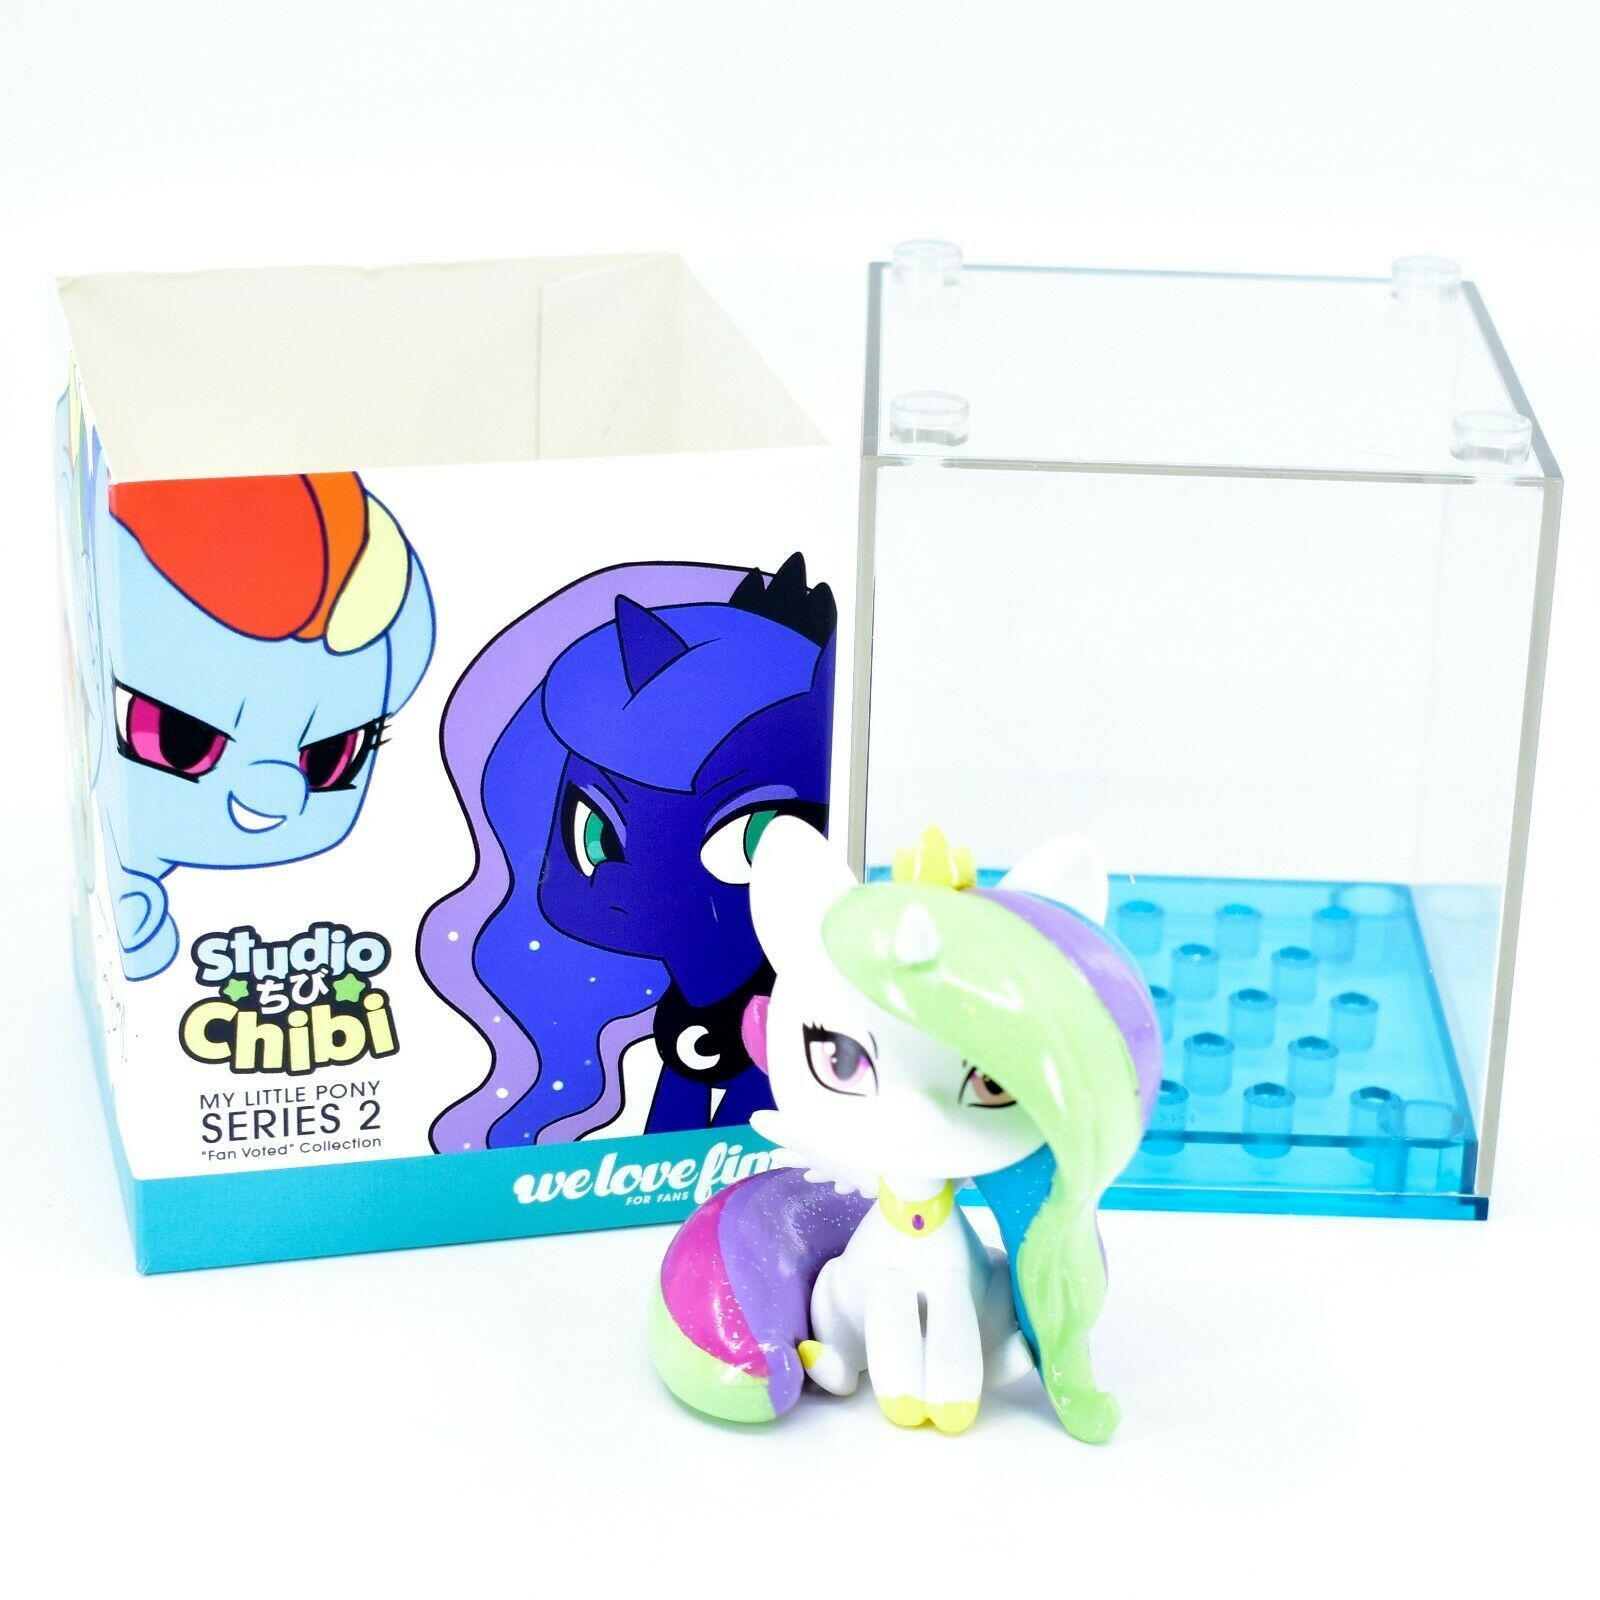 Studio Chibi My Little Pony Series 2 Princess Celestia Action Figure Statue